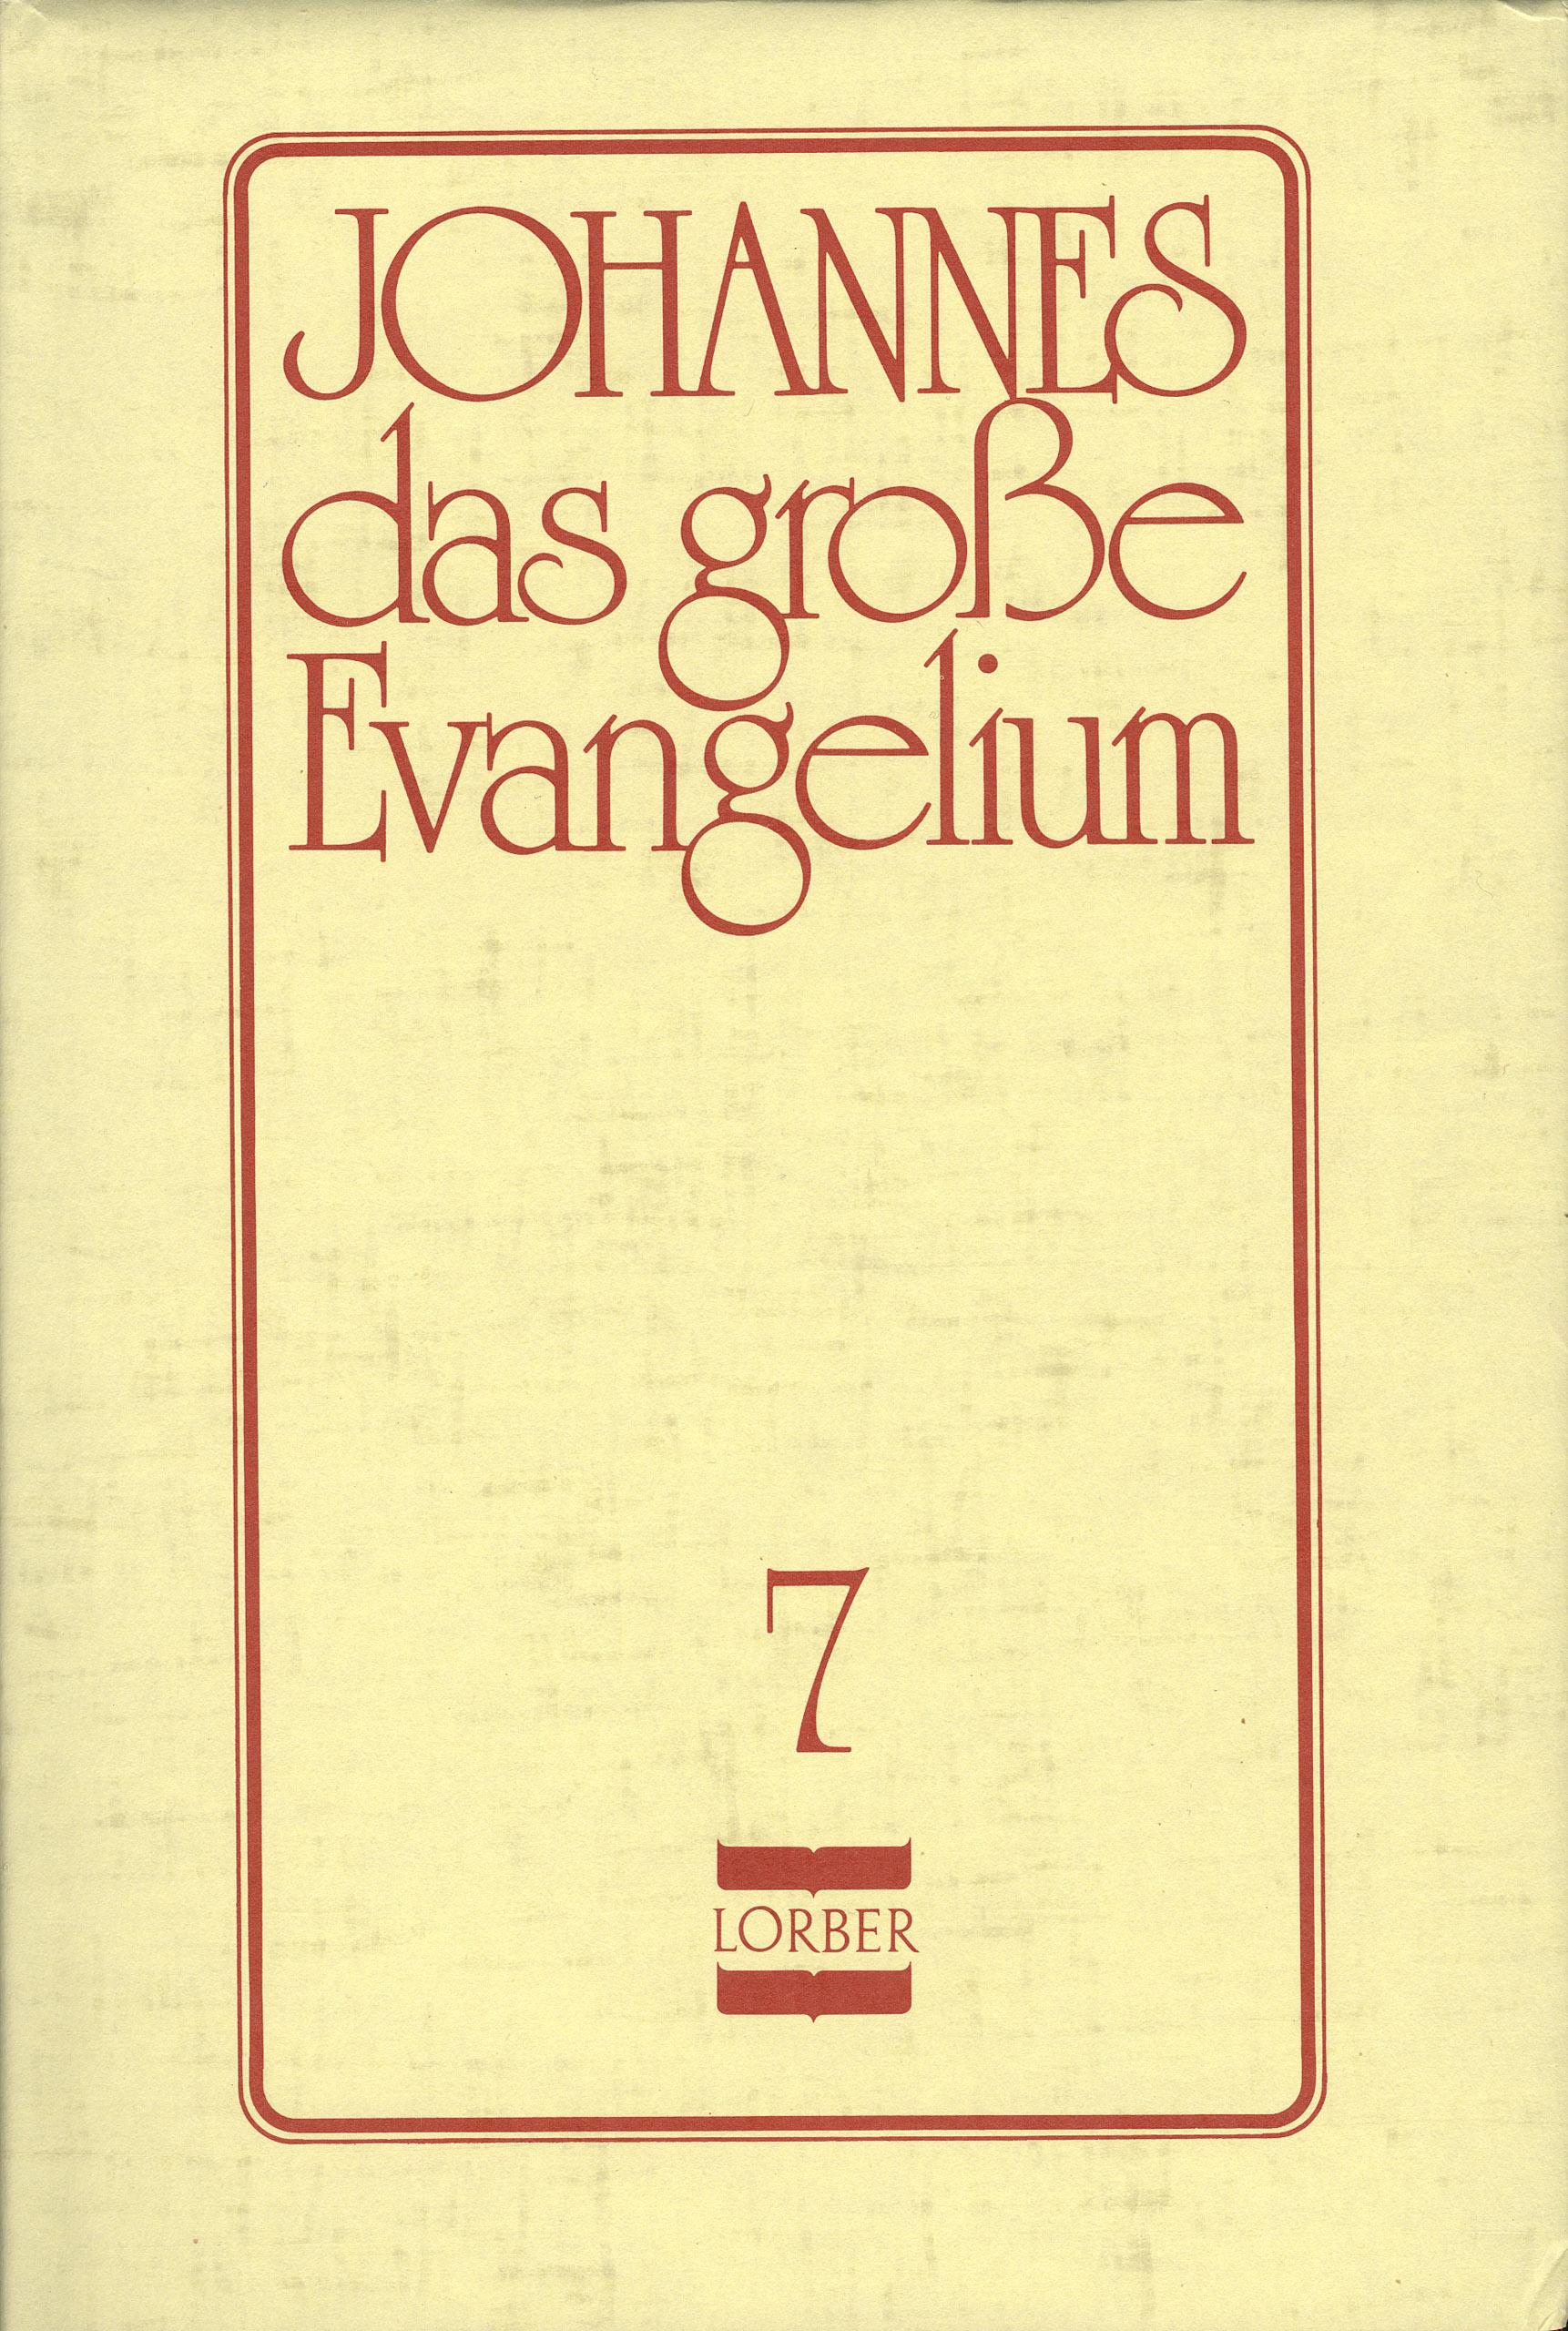 Johannes, das grosse Evangelium Jakob Lorber